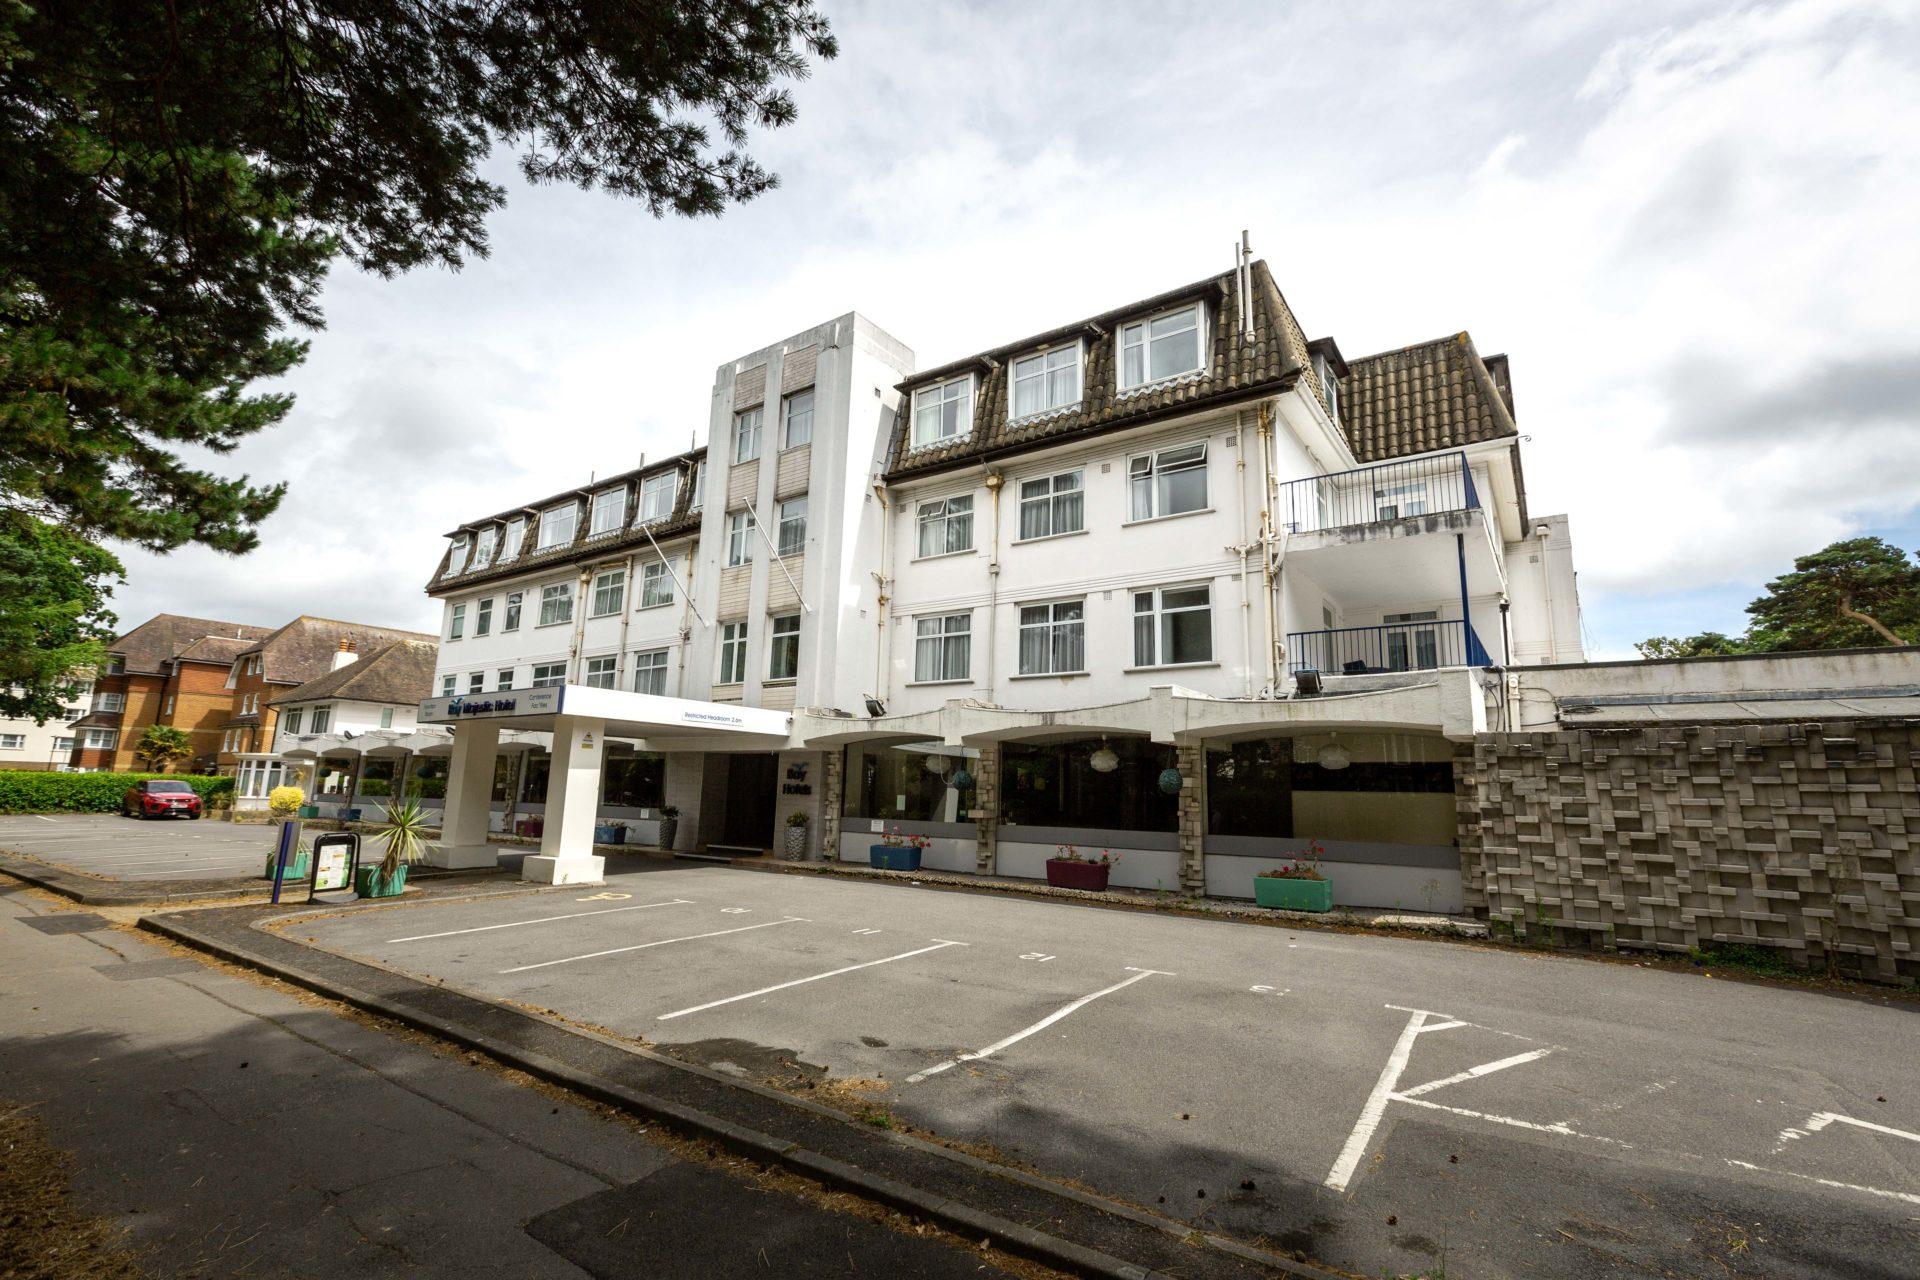 Majestic Hotel, Bournemouth 03.07.20-8043